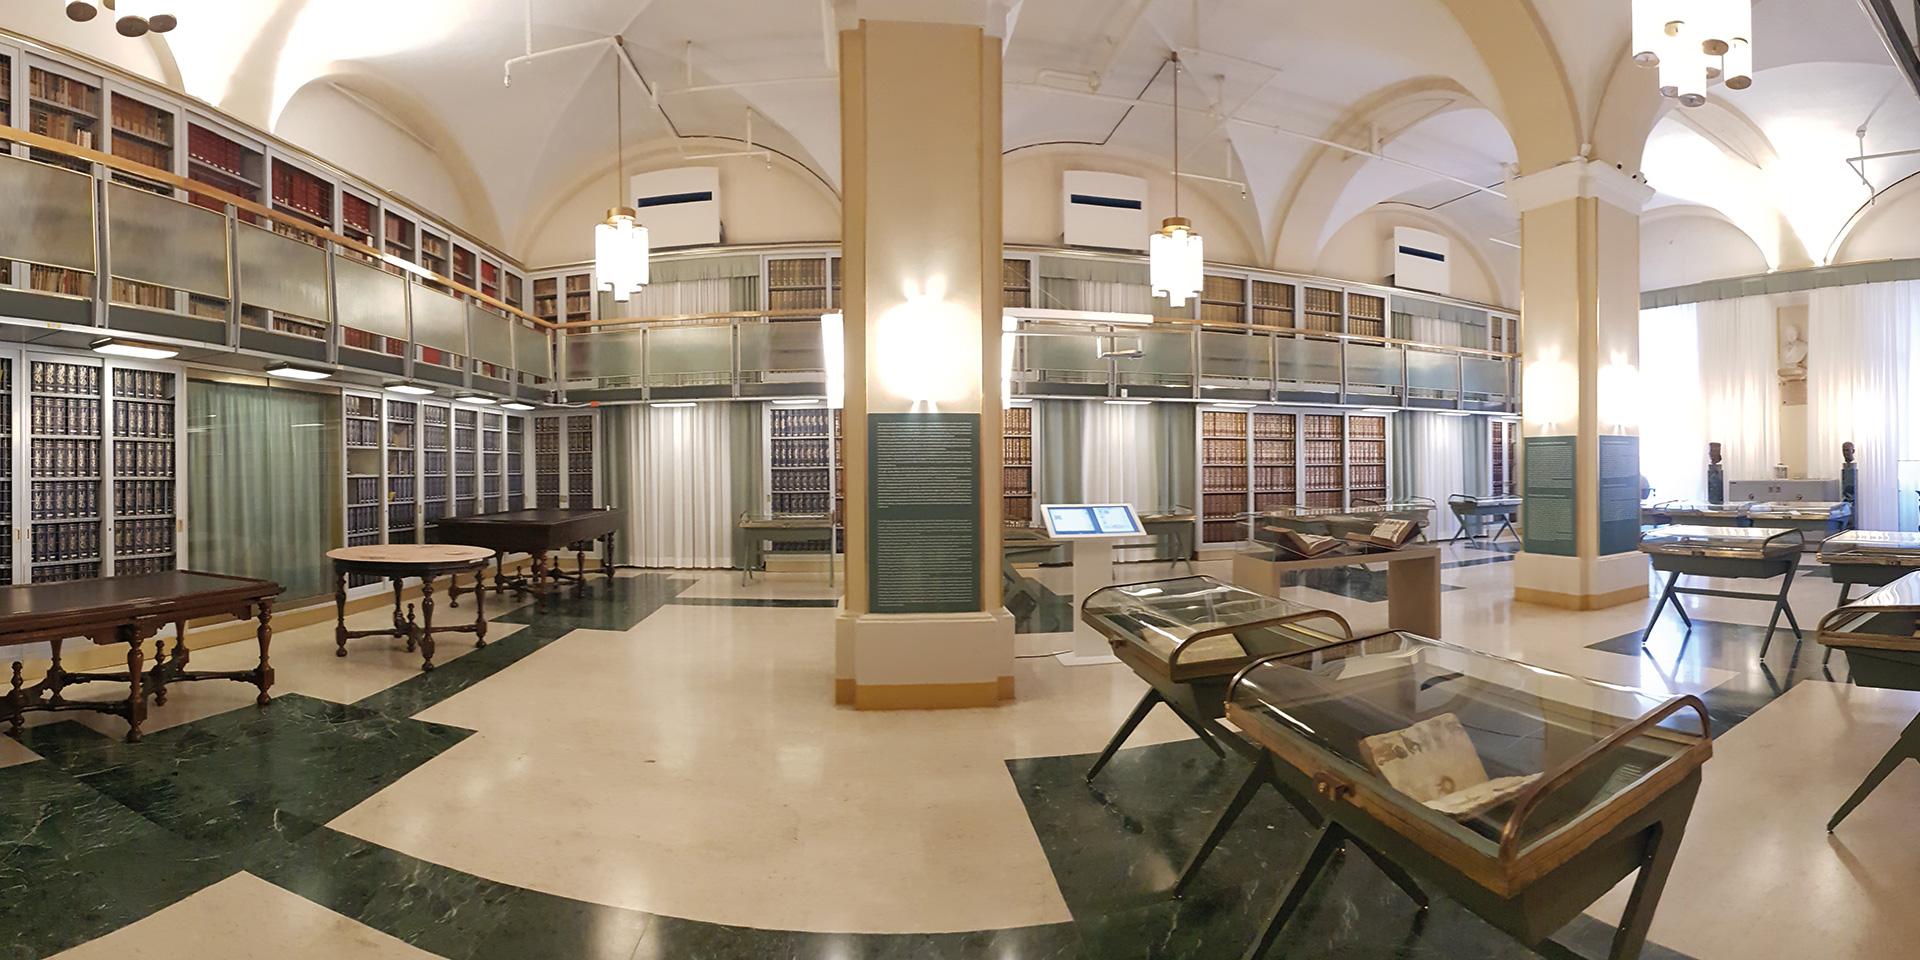 biblioteca universitaria estense